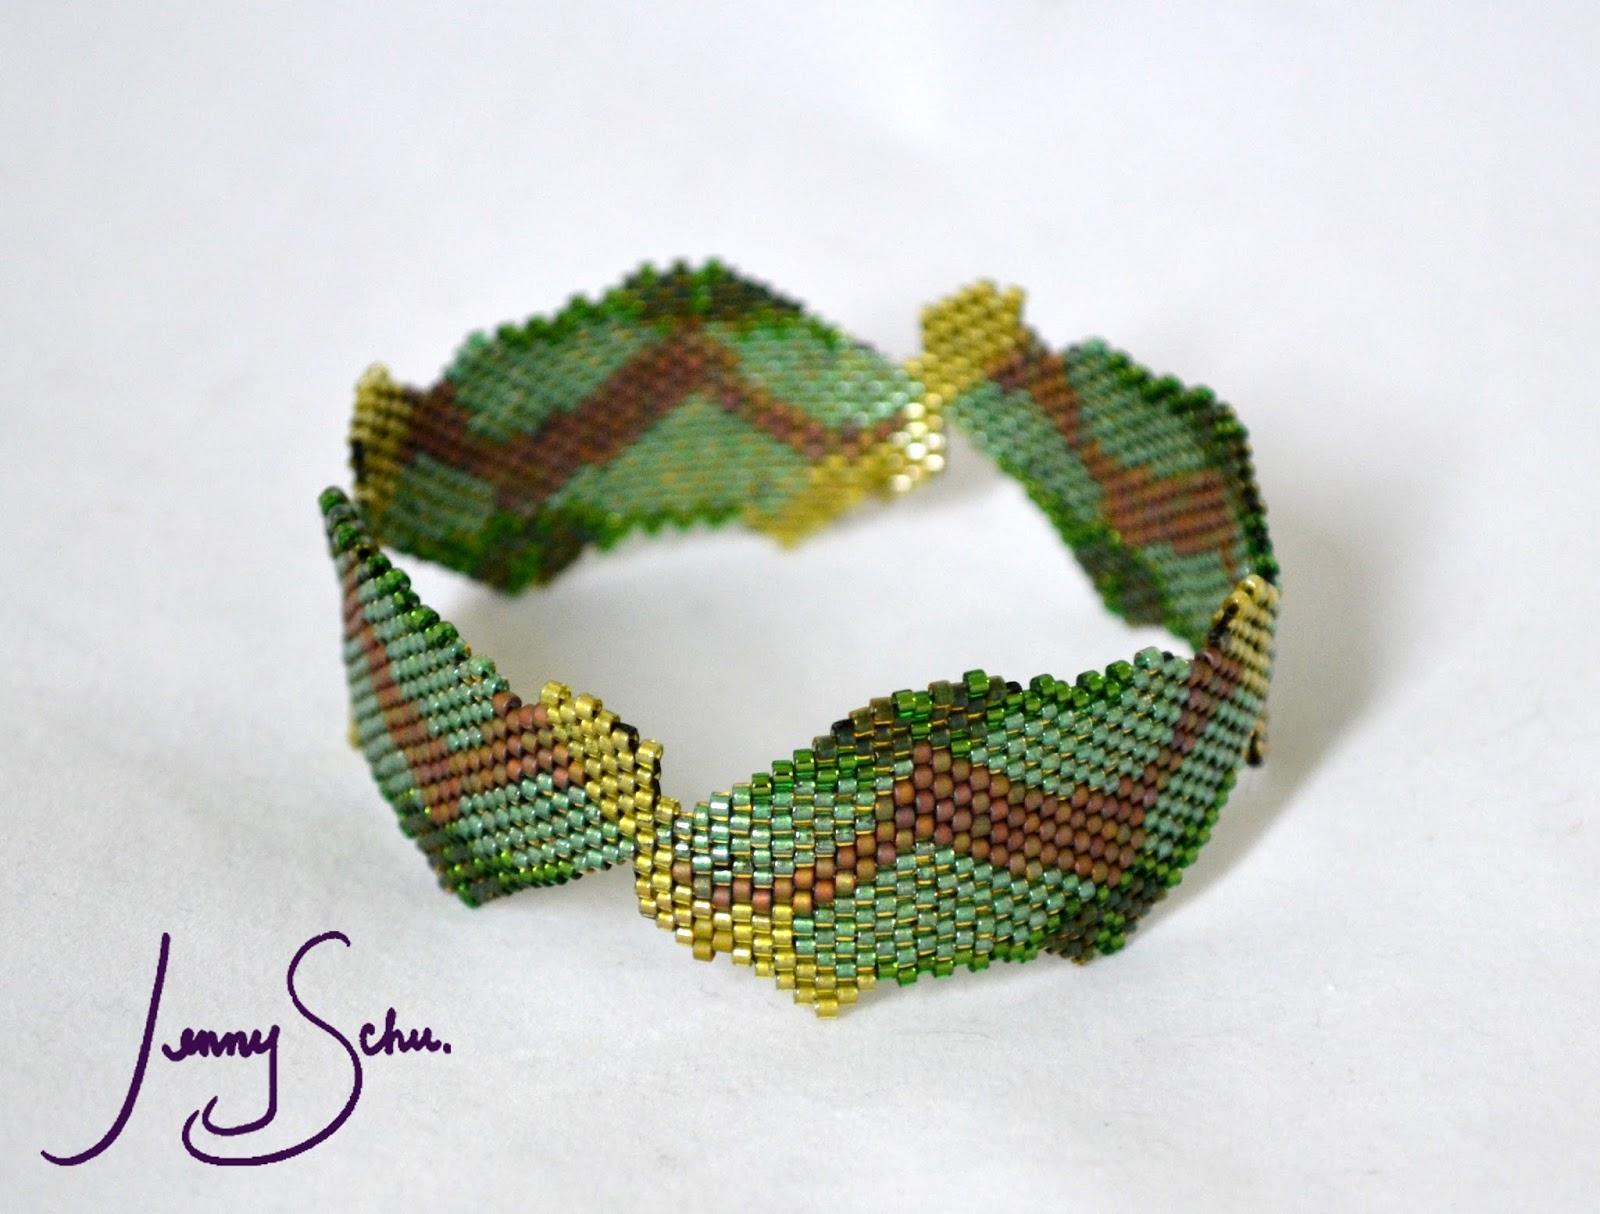 Jenny Schu: Beadweaving and Fiber Art: Maple Seed Bangle 1